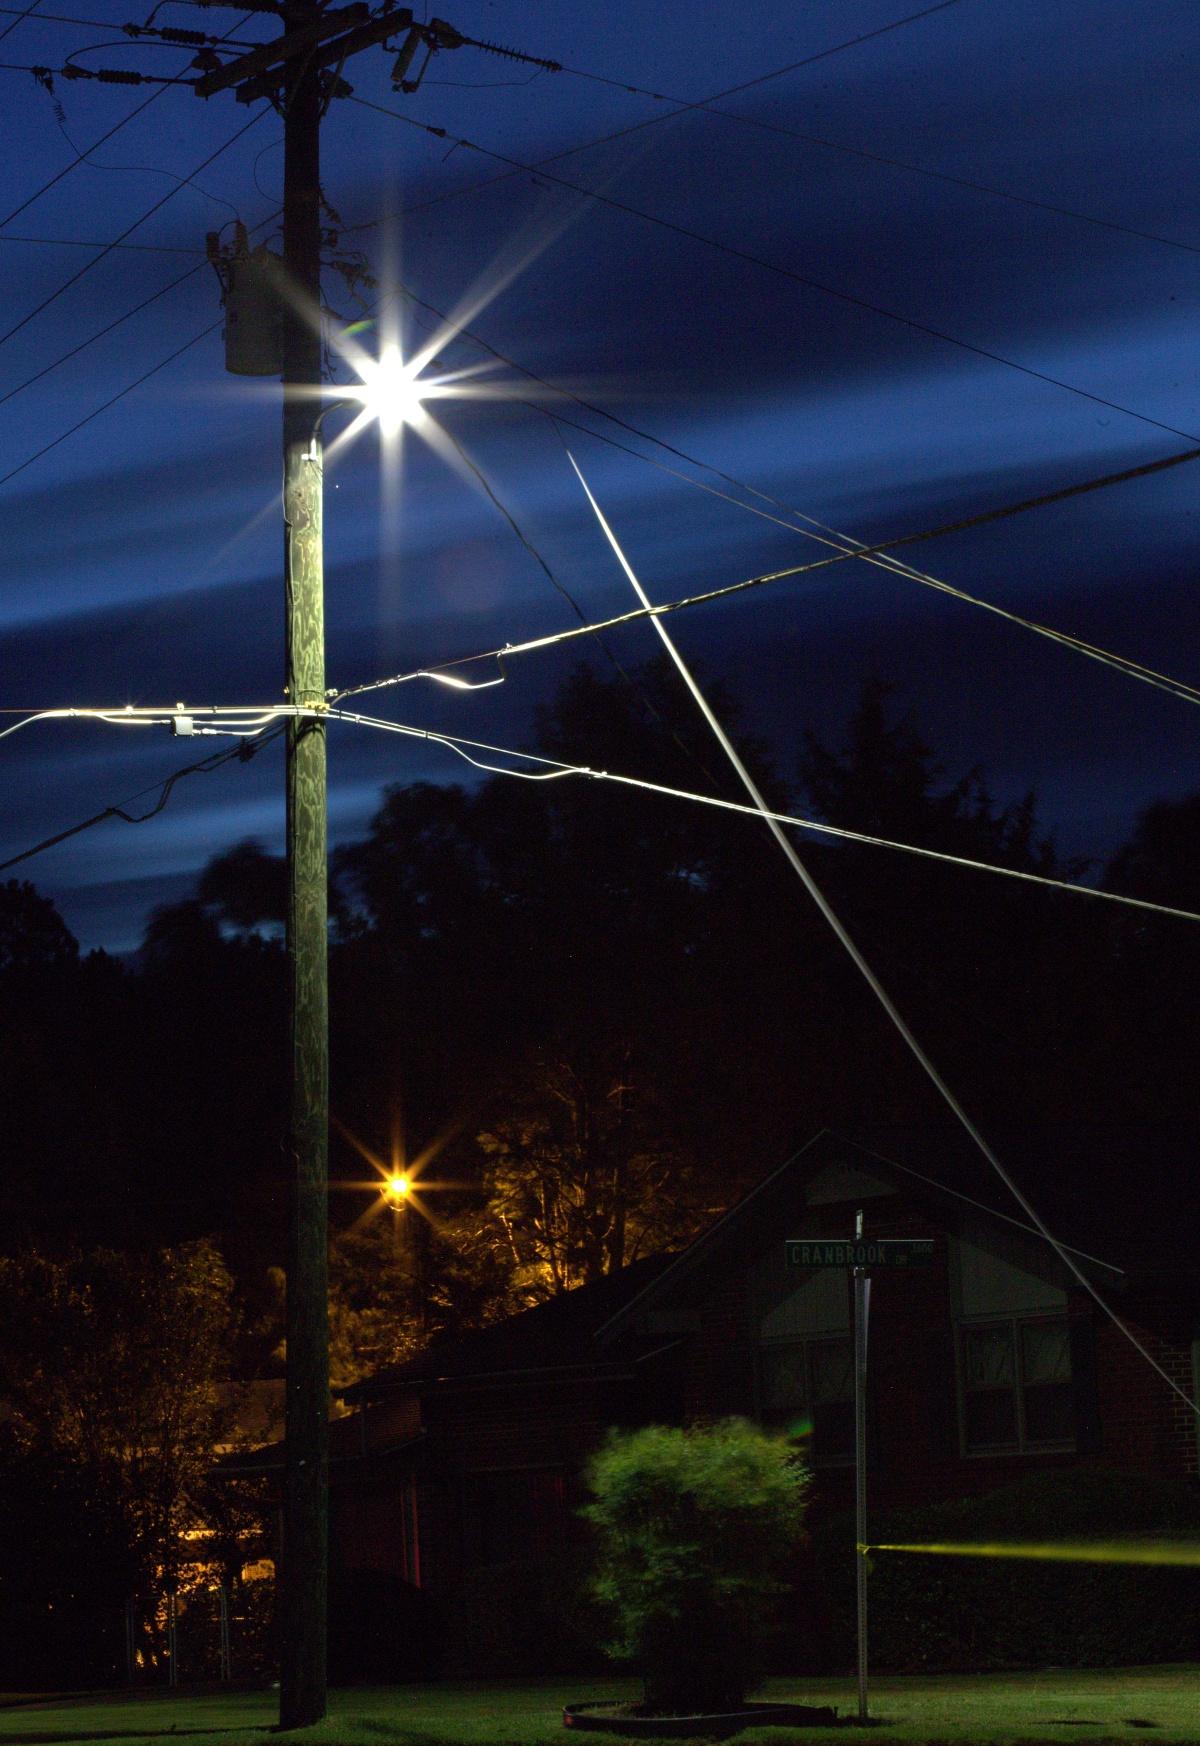 Storm ~ Hurricane Matthew, Fayetteville, North Carolina, 10/08 [from 11:29pm]